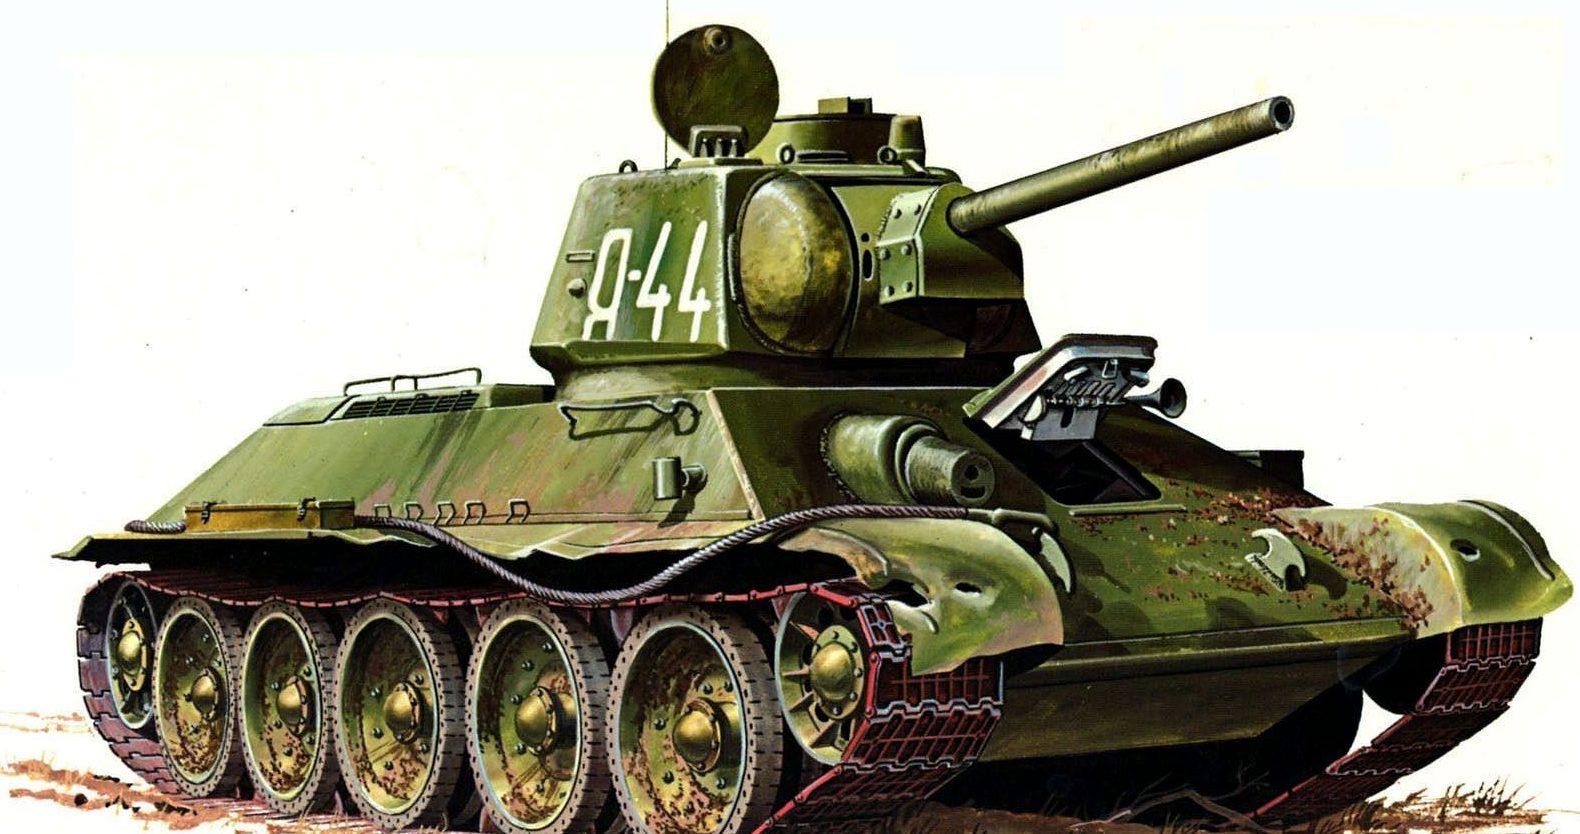 Greer Don. Огнеметный танк ОТ-34/76.